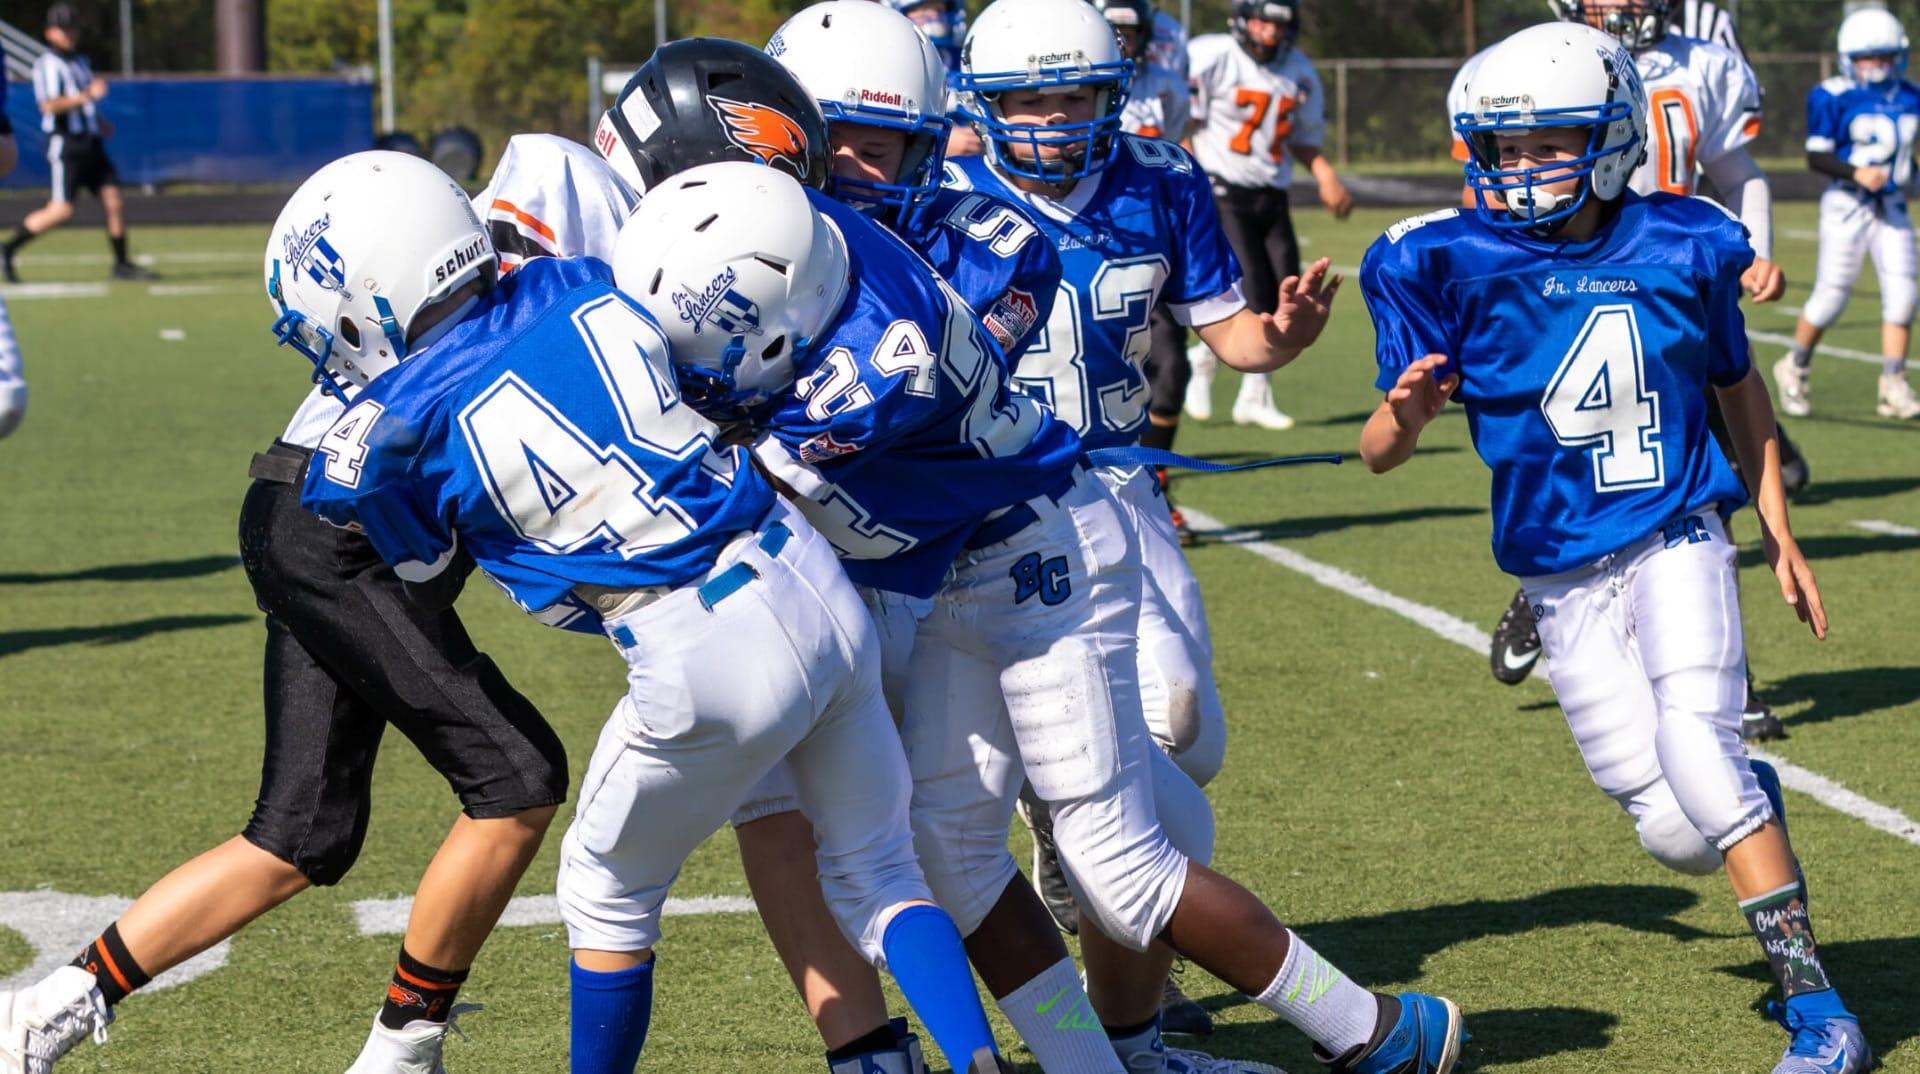 bc junior lancers football contact